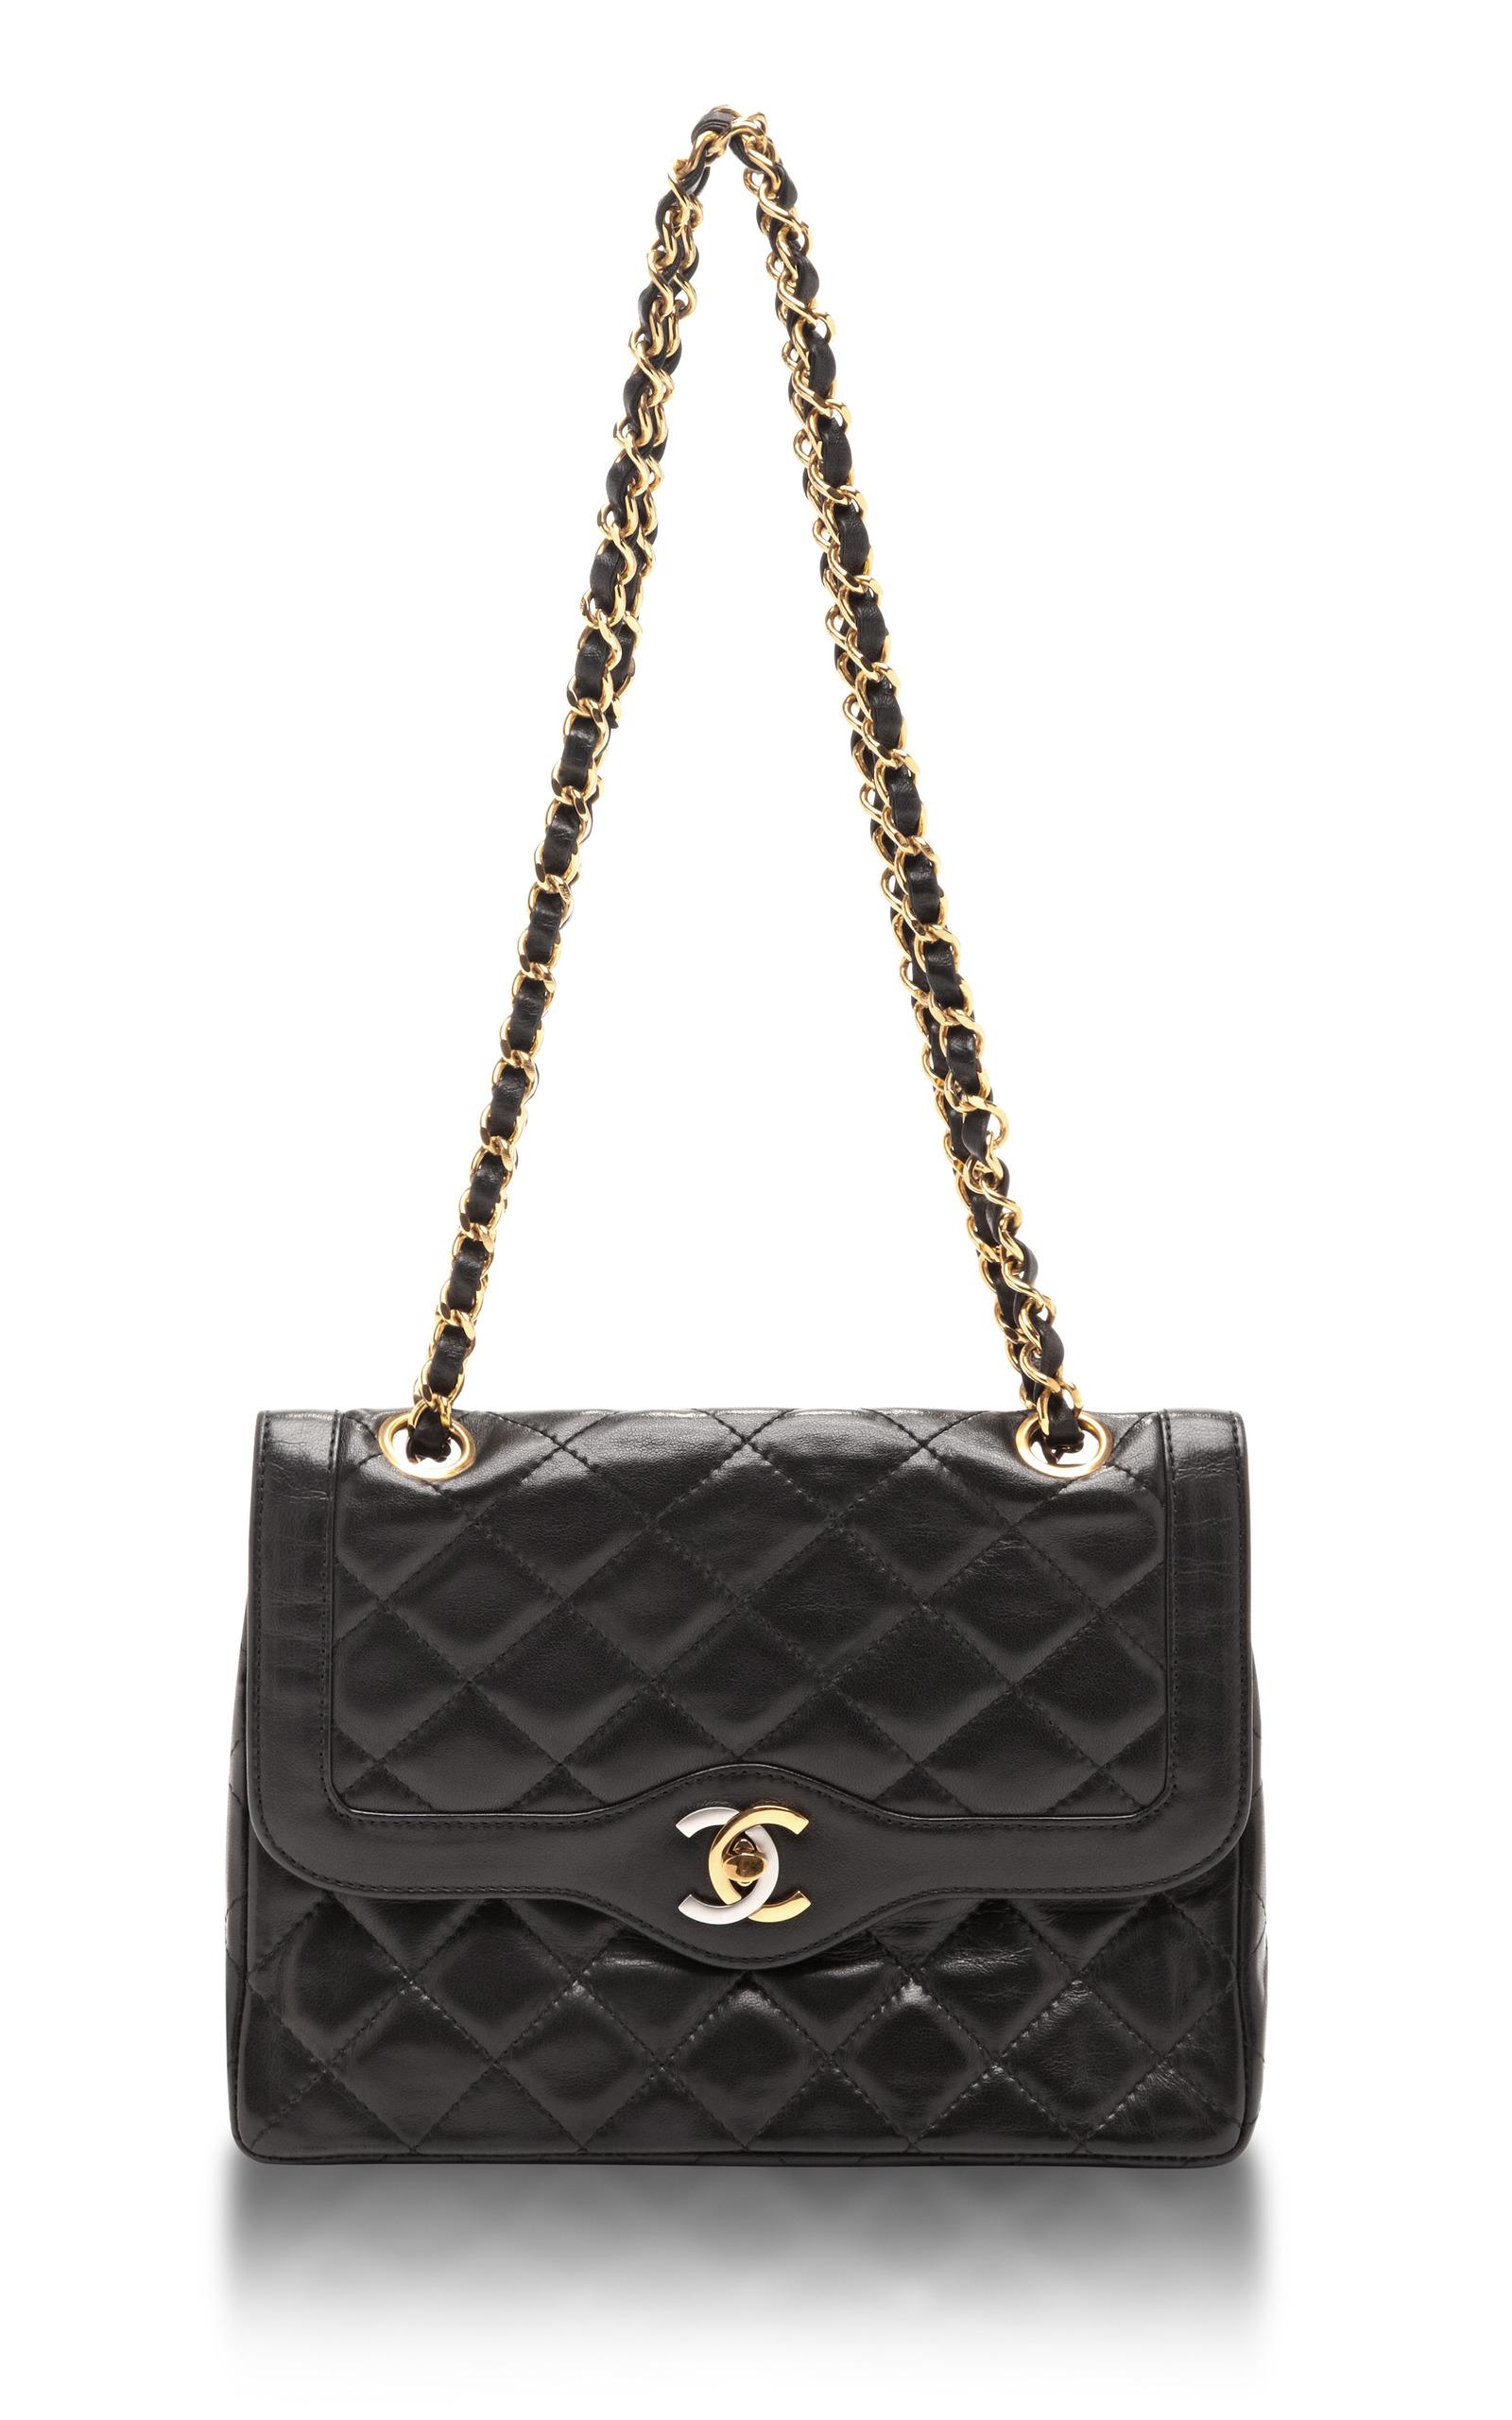 Chanel Väskor Vintage : Vintage chanel paris limited edition small bag by moda